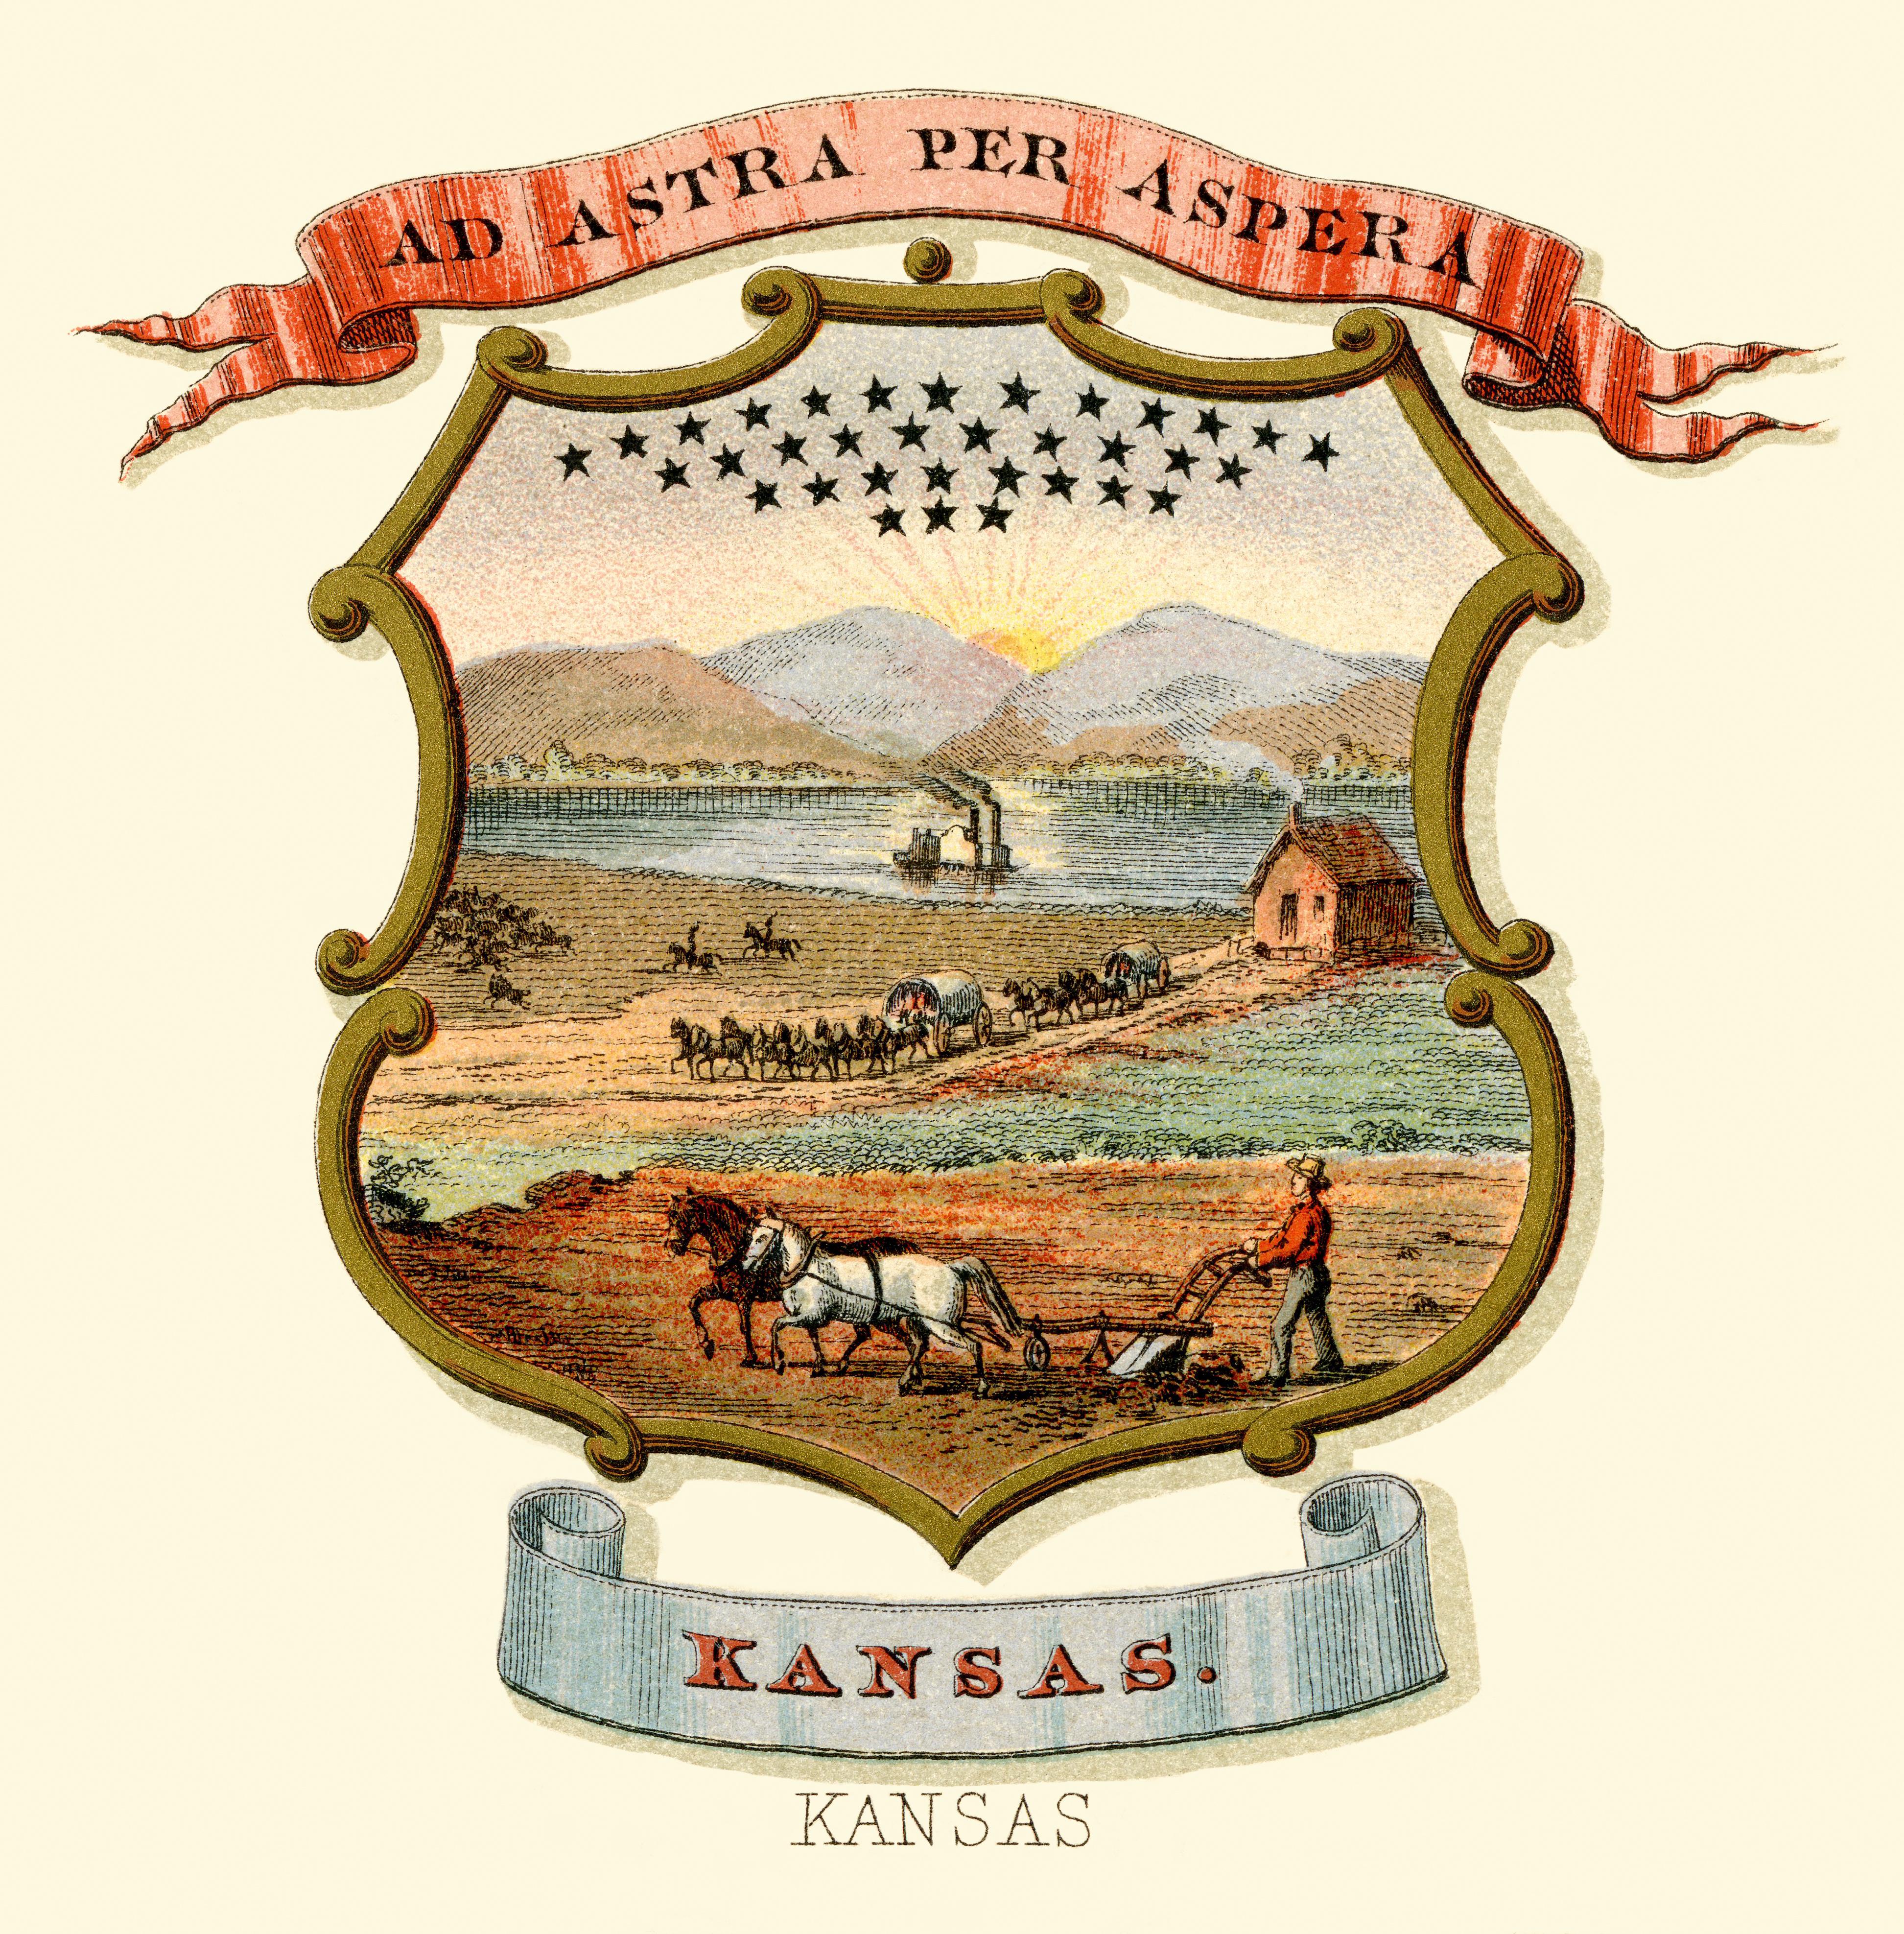 File:Kansas state coat of arms (illustrated, 1876).jpg - Wikipedia